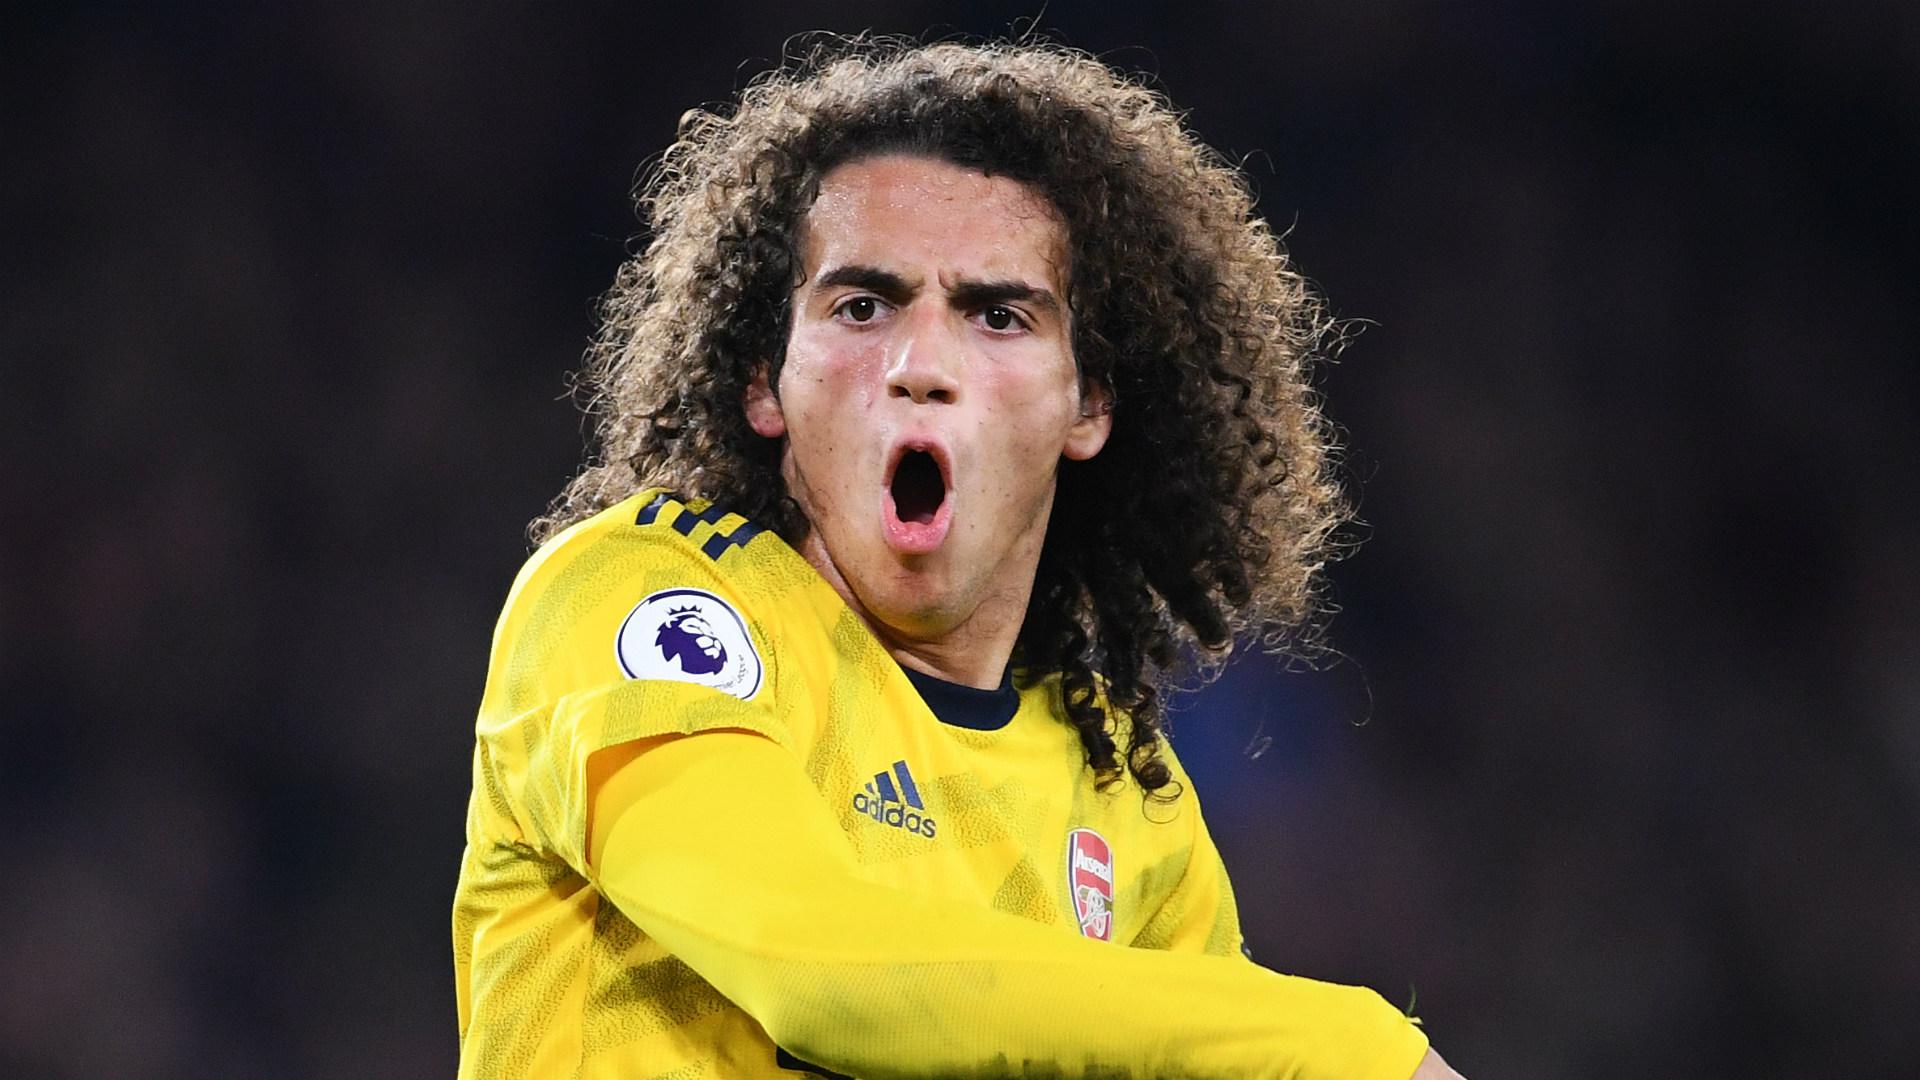 'Petulant Guendouzi needs a Vieira at Arsenal' – French youngster lacking leadership, says Dixon